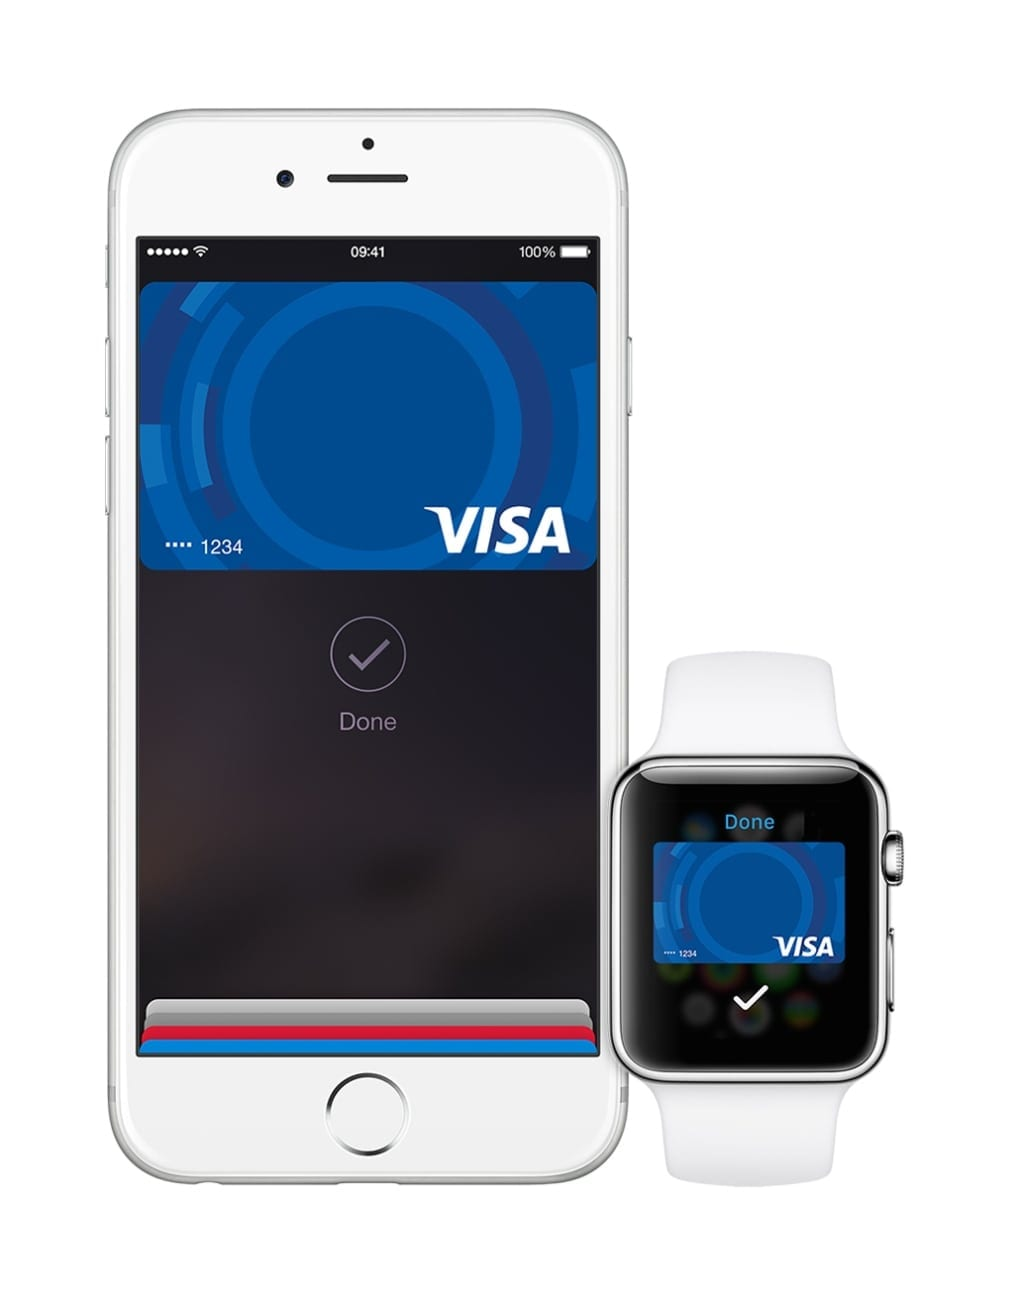 iPhone watch Visa